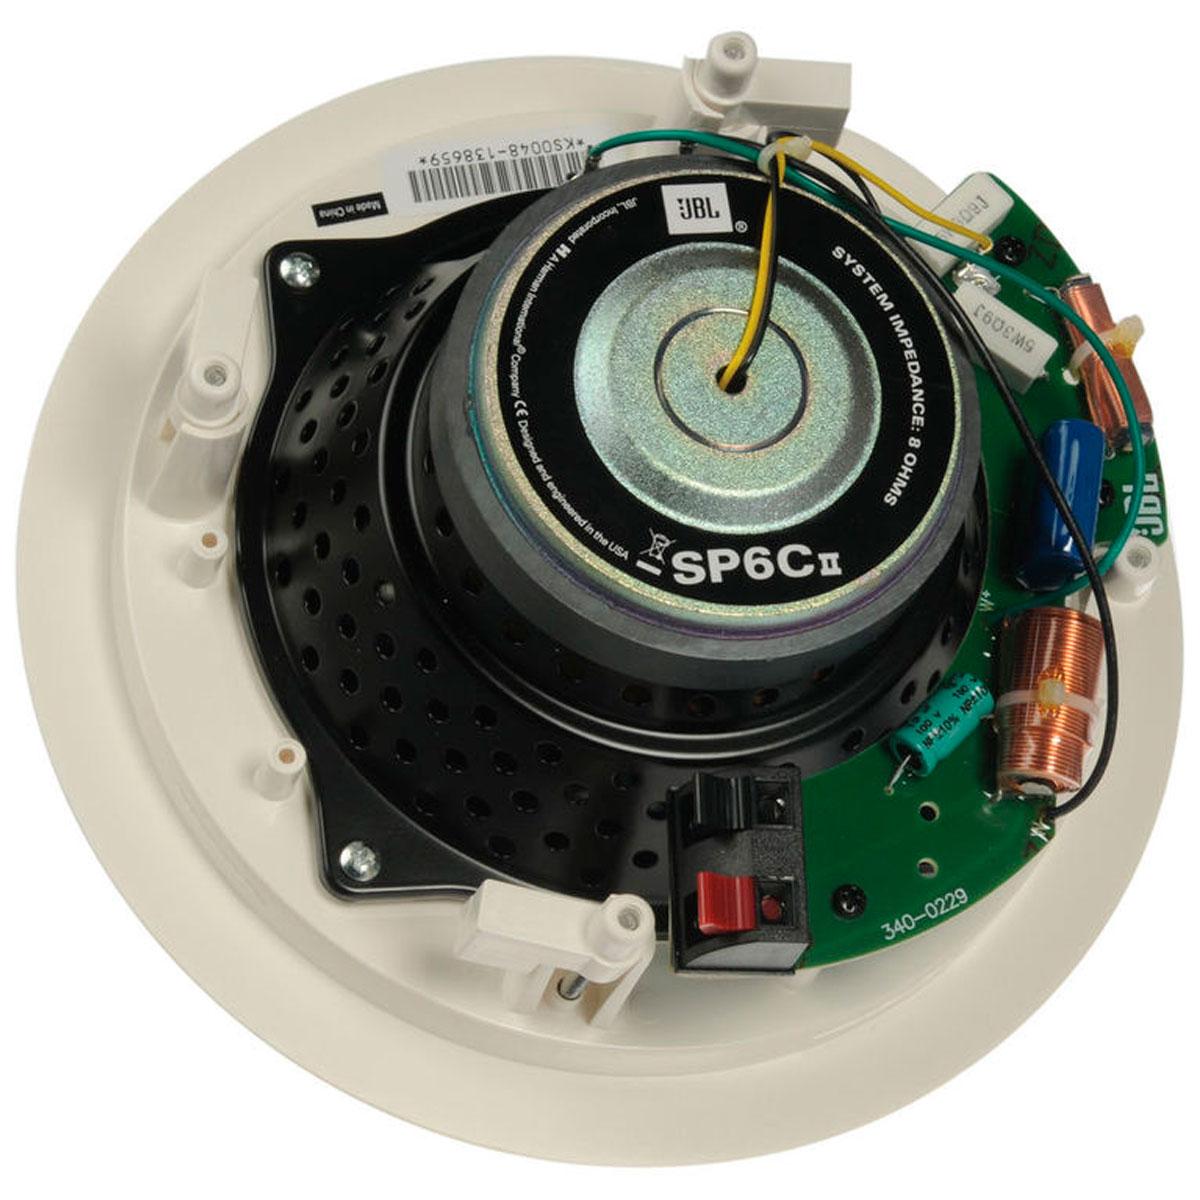 Arandela Coaxial Redonda Fal 6 Pol 80W - SP 6 C II JBL